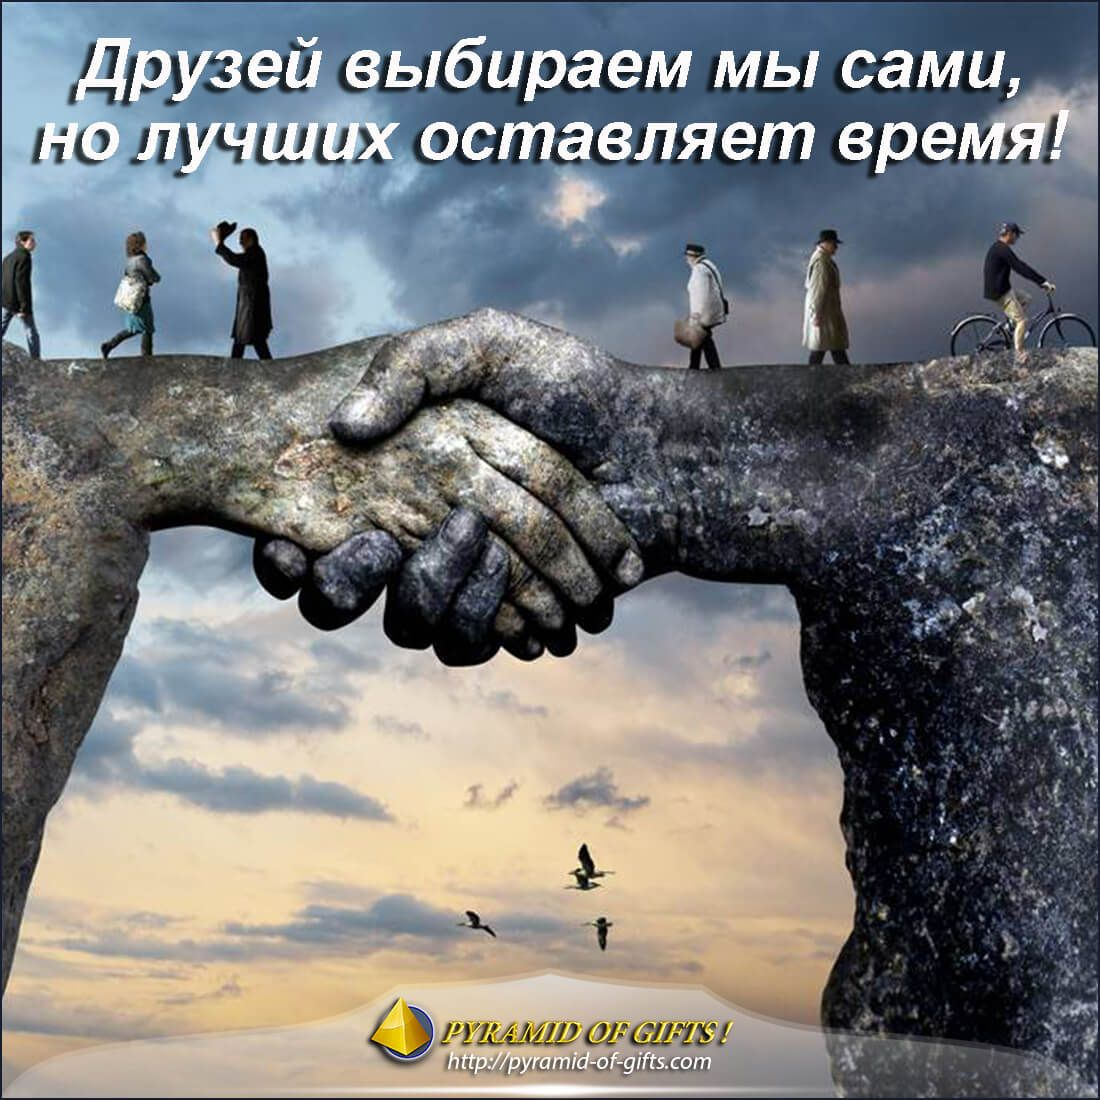 Снежана друзенко фото яркая наружная